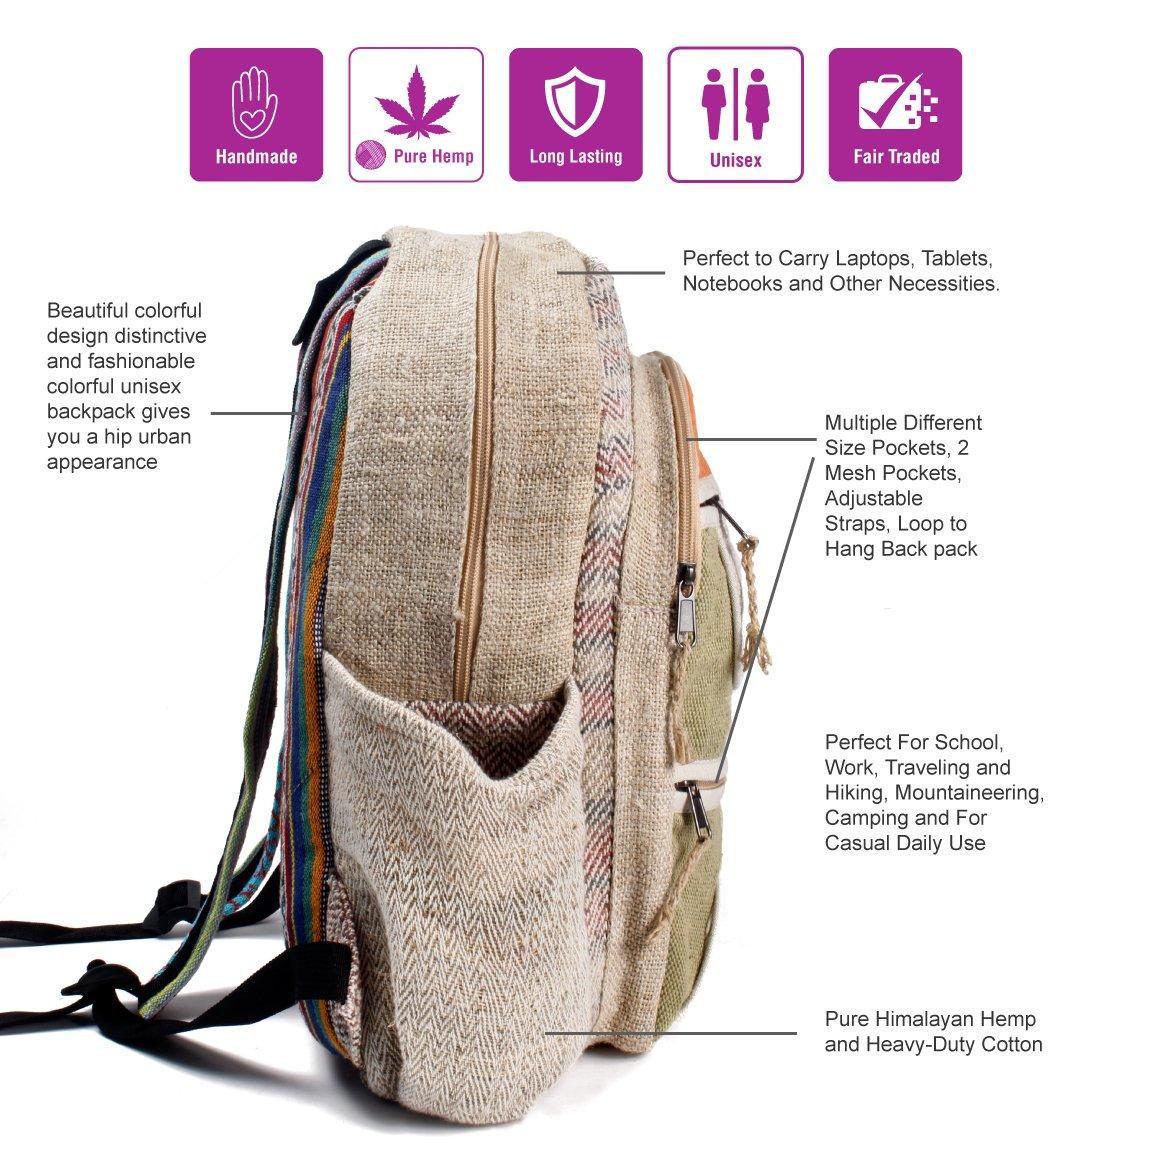 Maha Bodhi All Natural Handmade Multi Pocket Laptop Backpack – Himalayan Hemp